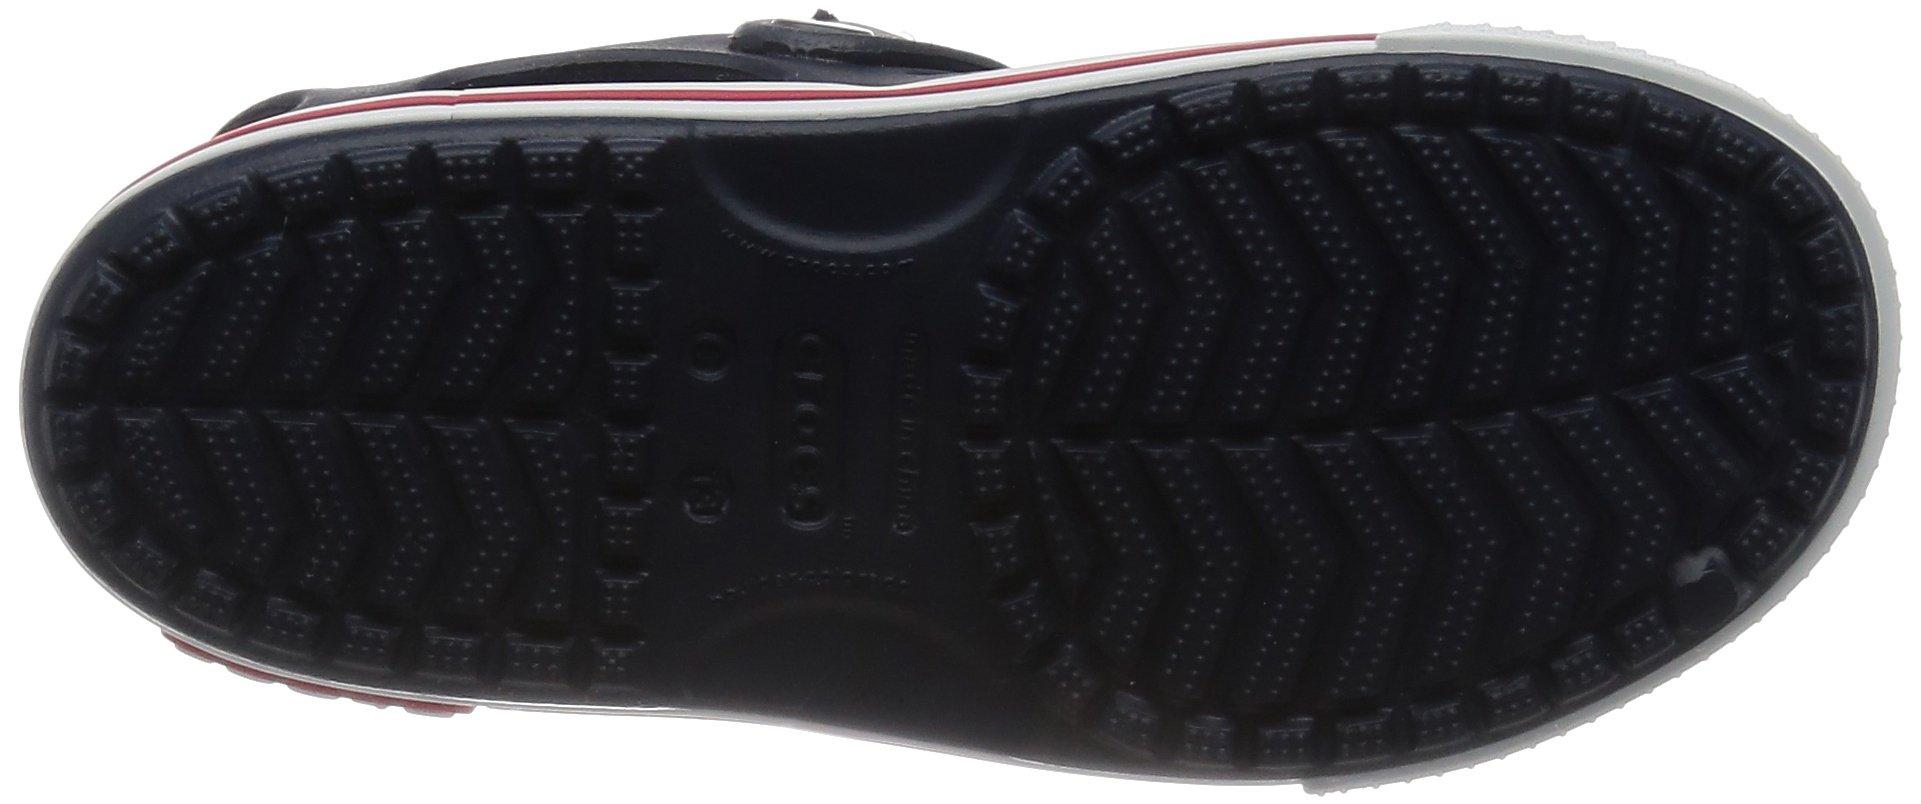 Crocs Kid's Boys and Girls Crocband II Sandal | Pre School, Navy/White, 5 M US Toddler by Crocs (Image #3)